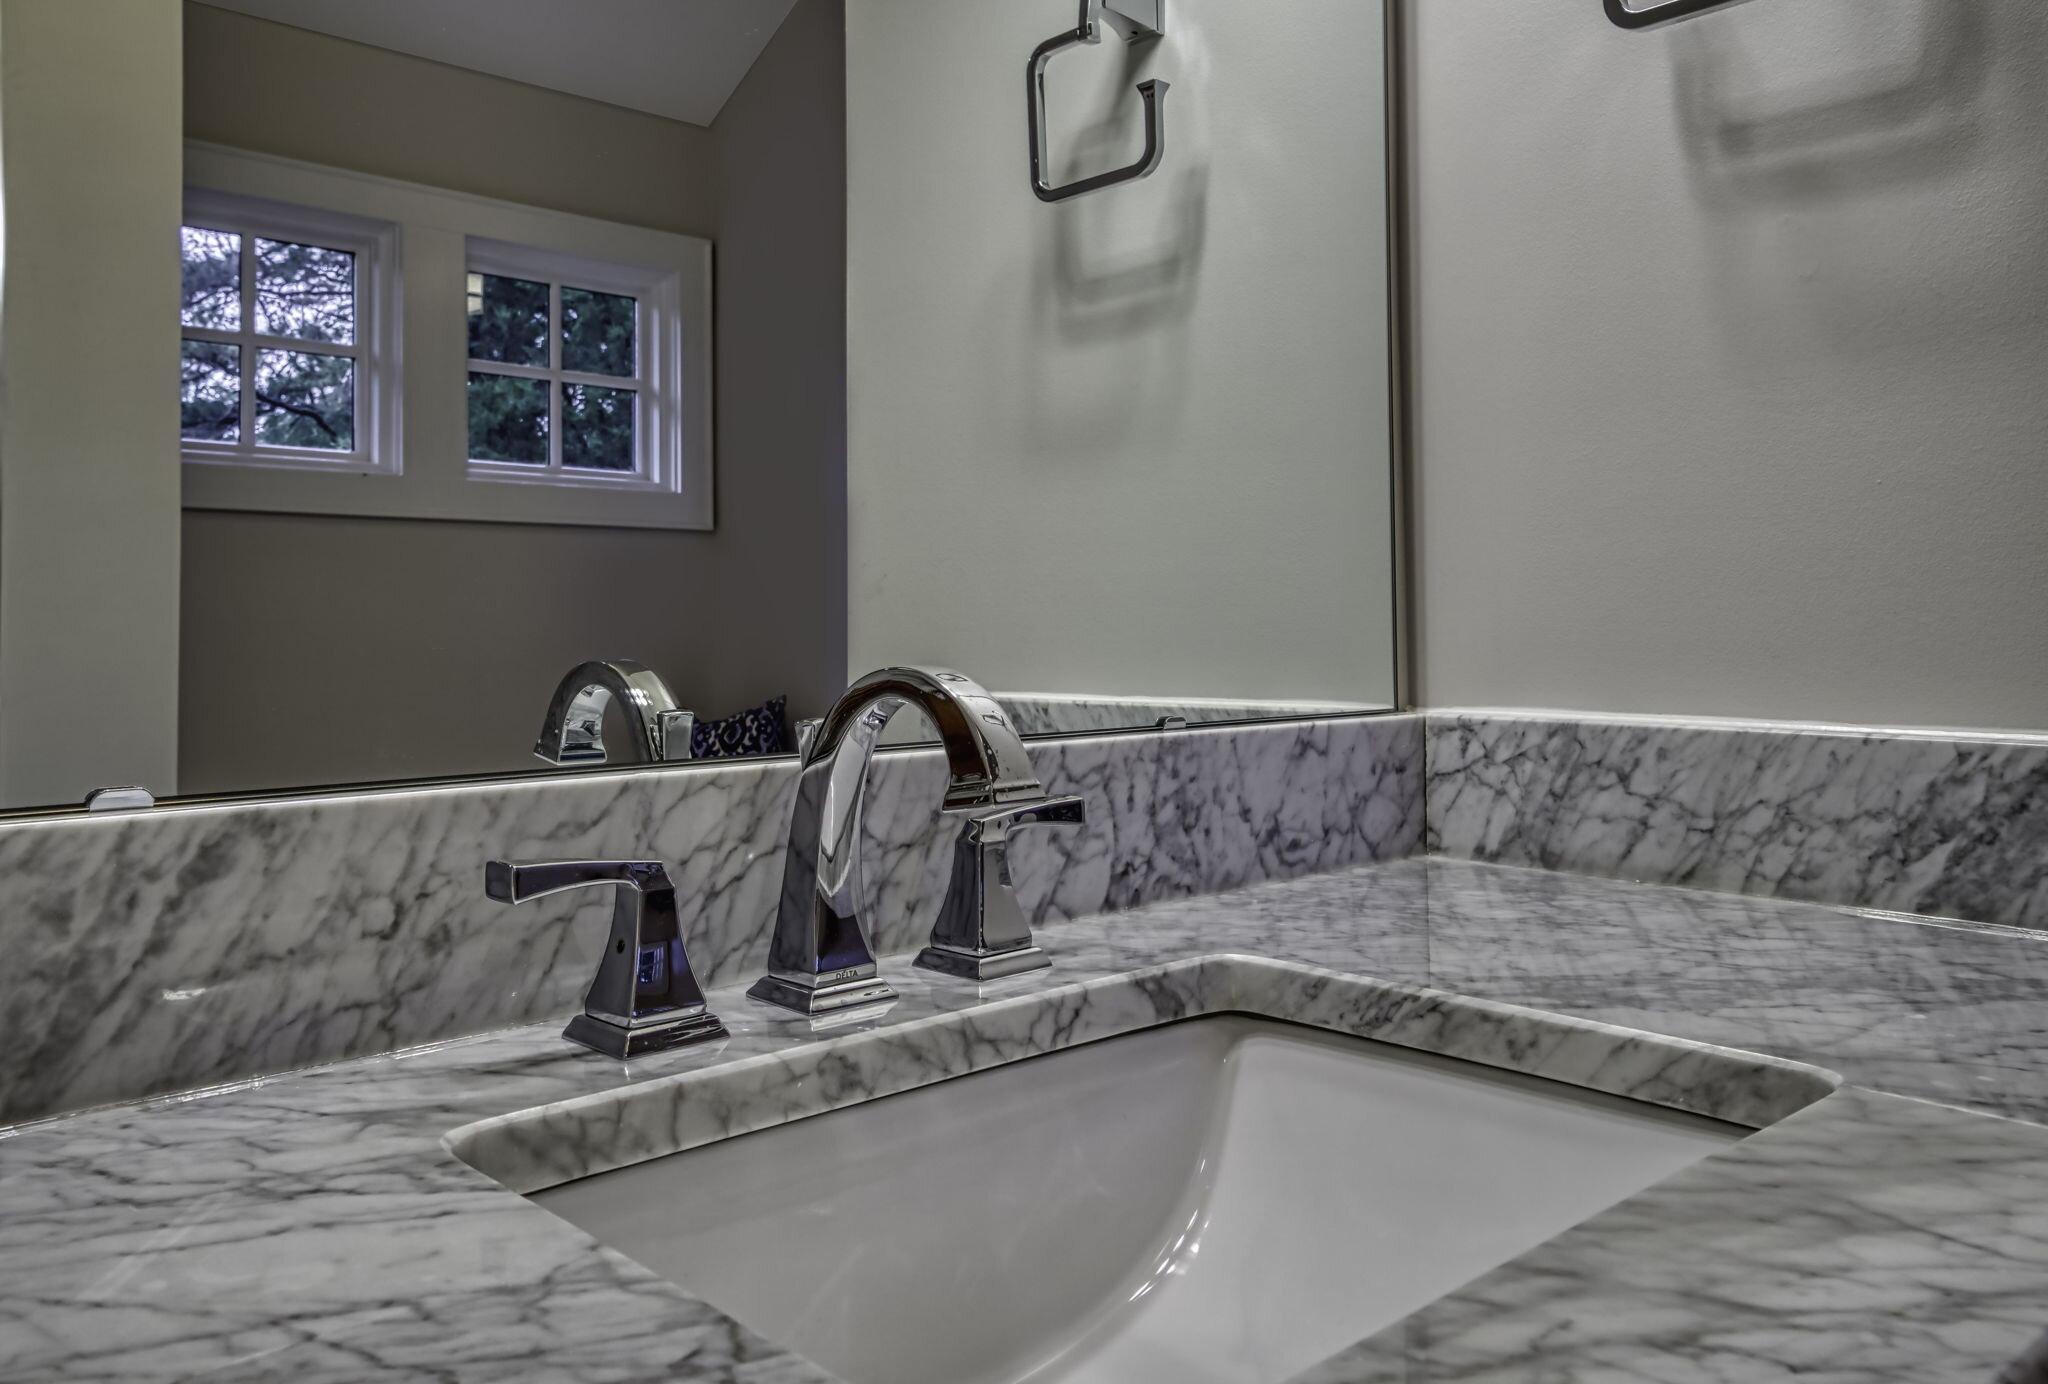 32-web-or-mls-4900 Carmel Park Dr Bedroom Bath 2.jpg